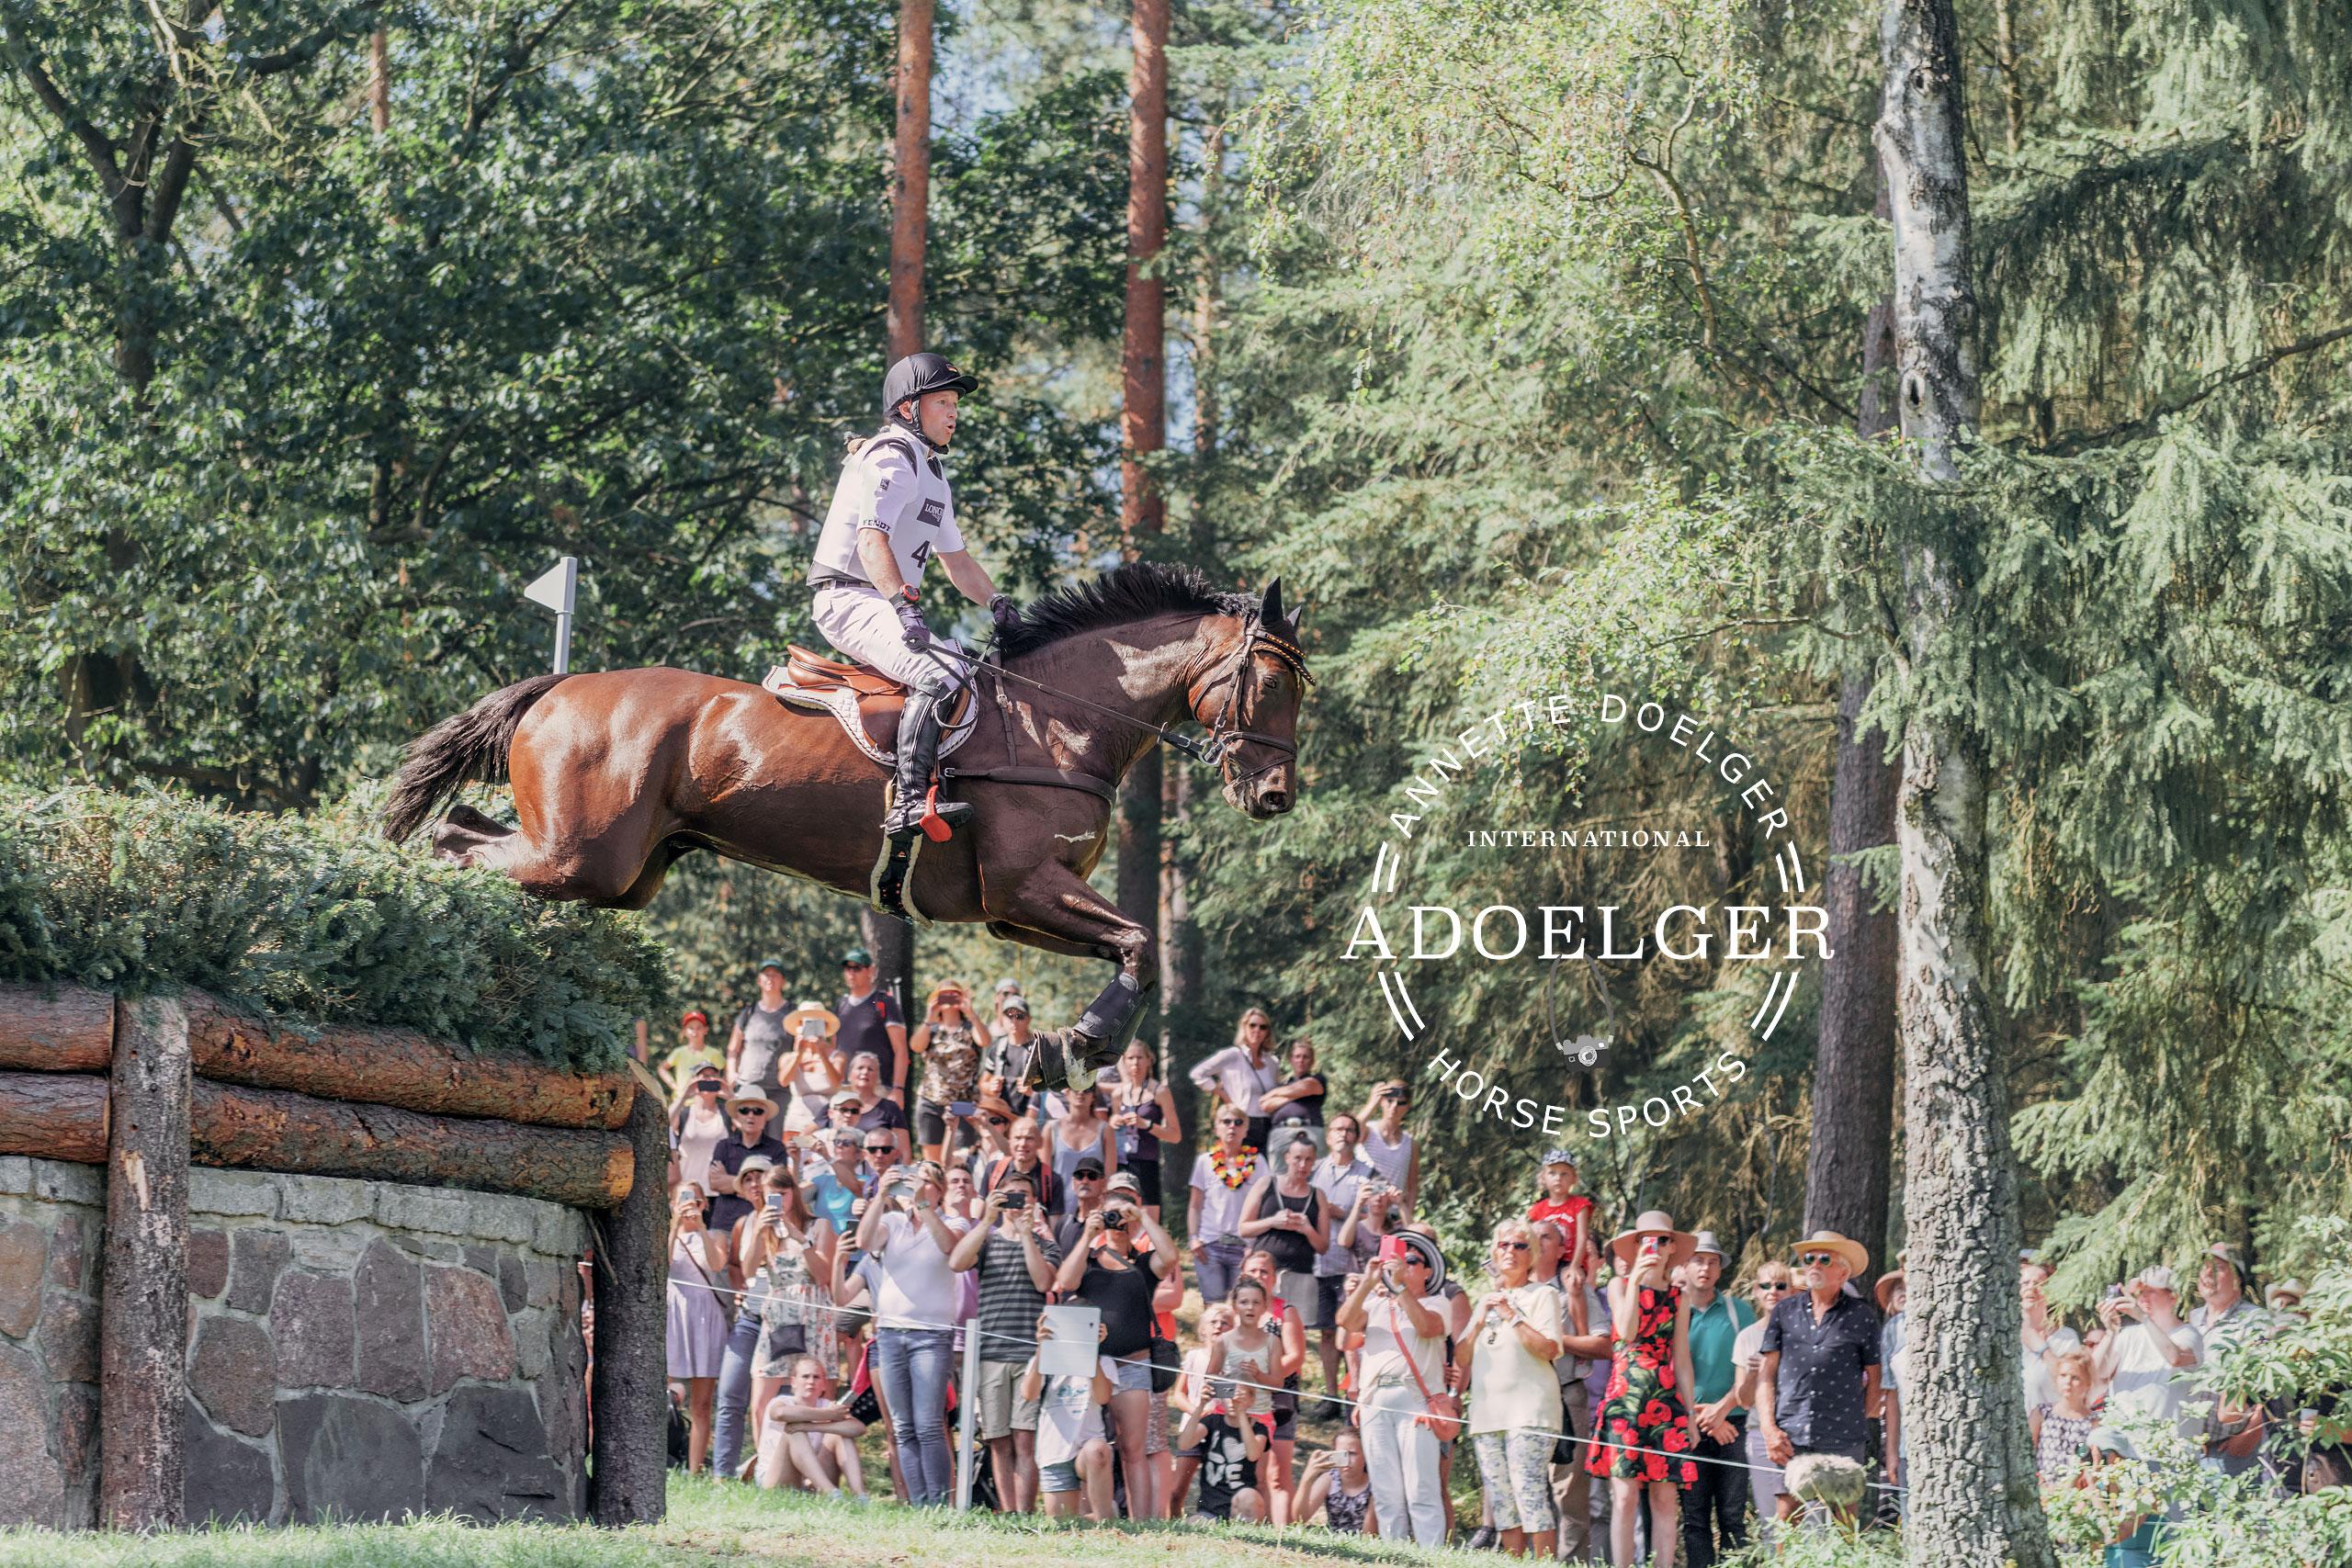 Michael Jung fischerChipmunk FRH European Championships Eventing Luhmuehlen 2019